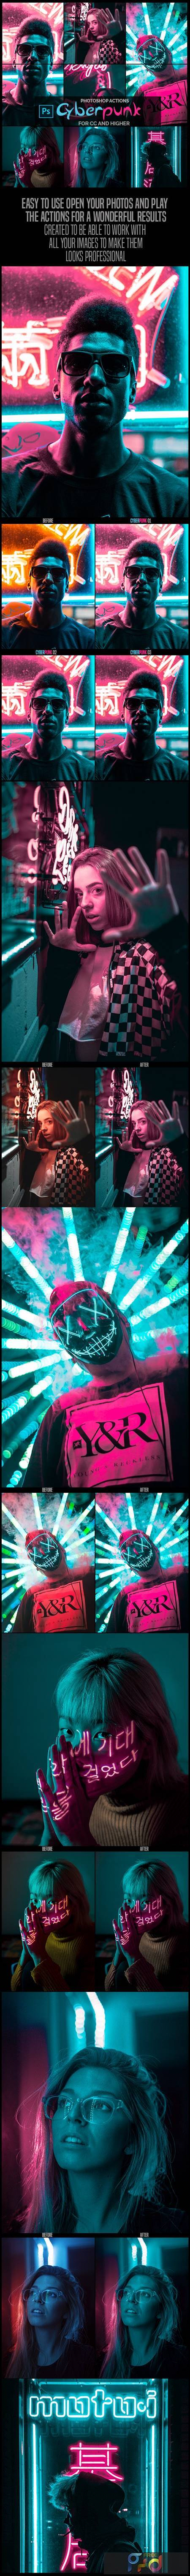 Cyberpunk - Photoshop Actions 26311519 1